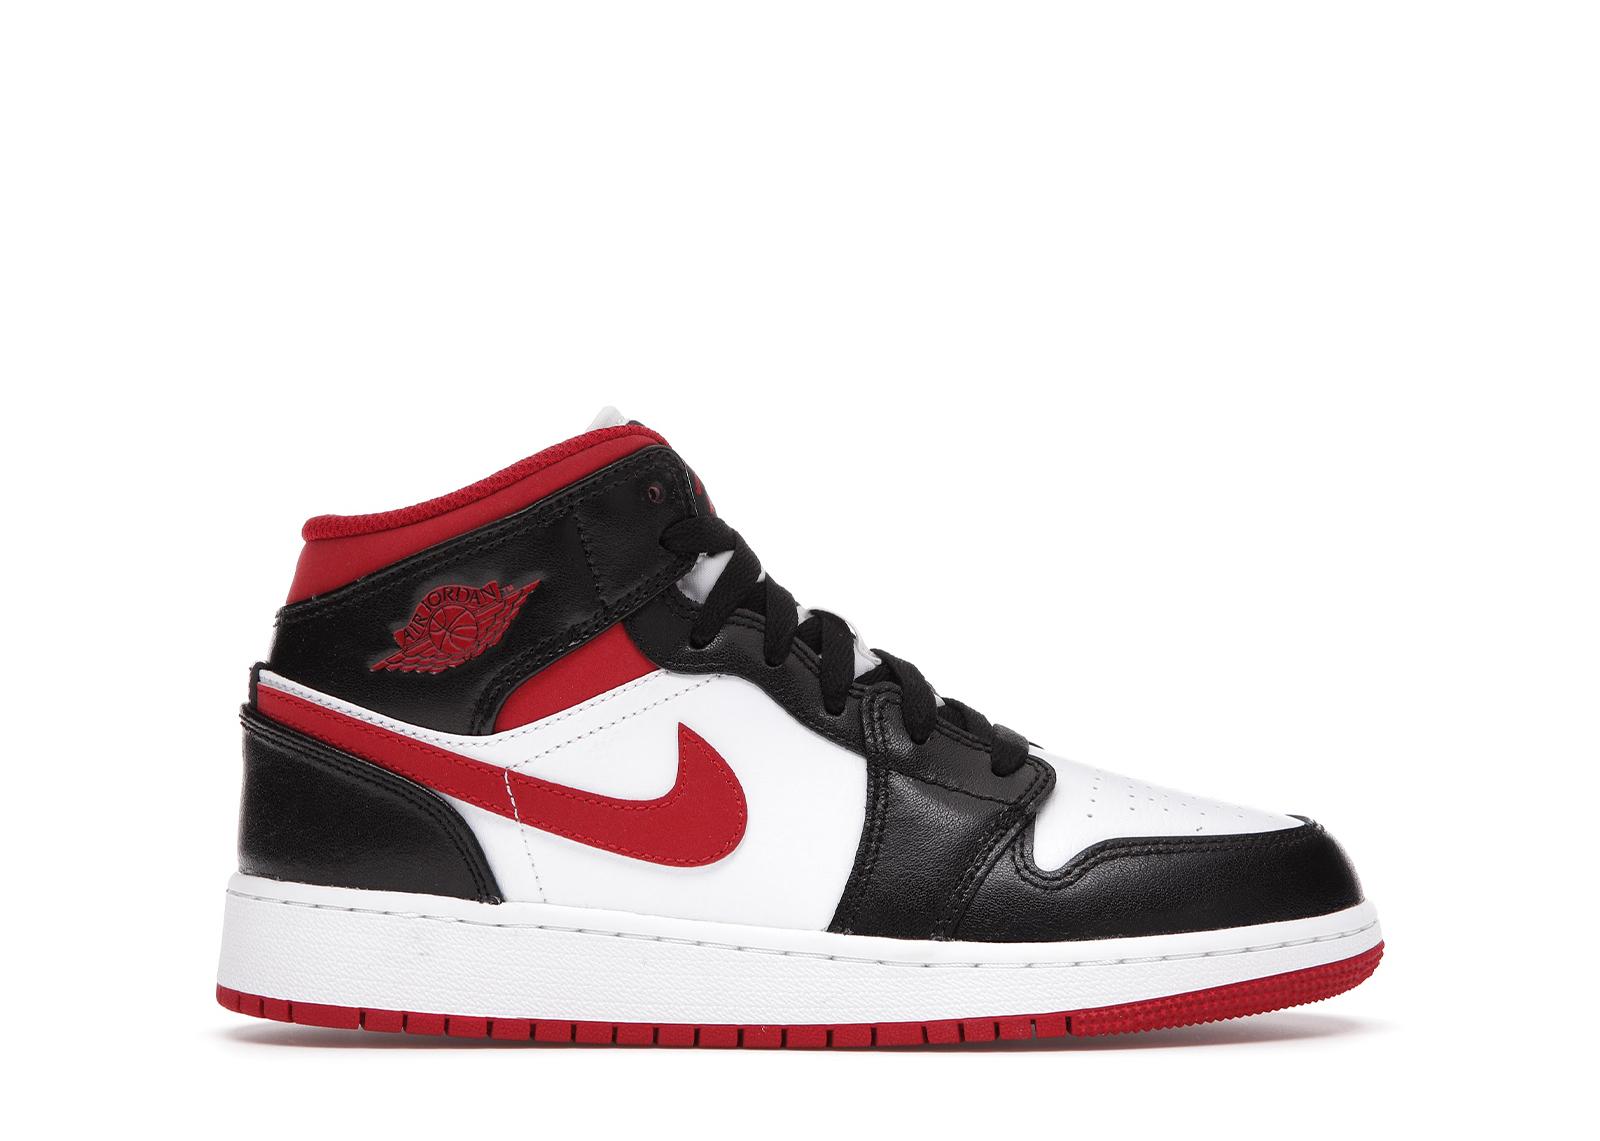 Jordan 1 Mid Gym Red Black White (GS) - DJ4695-122